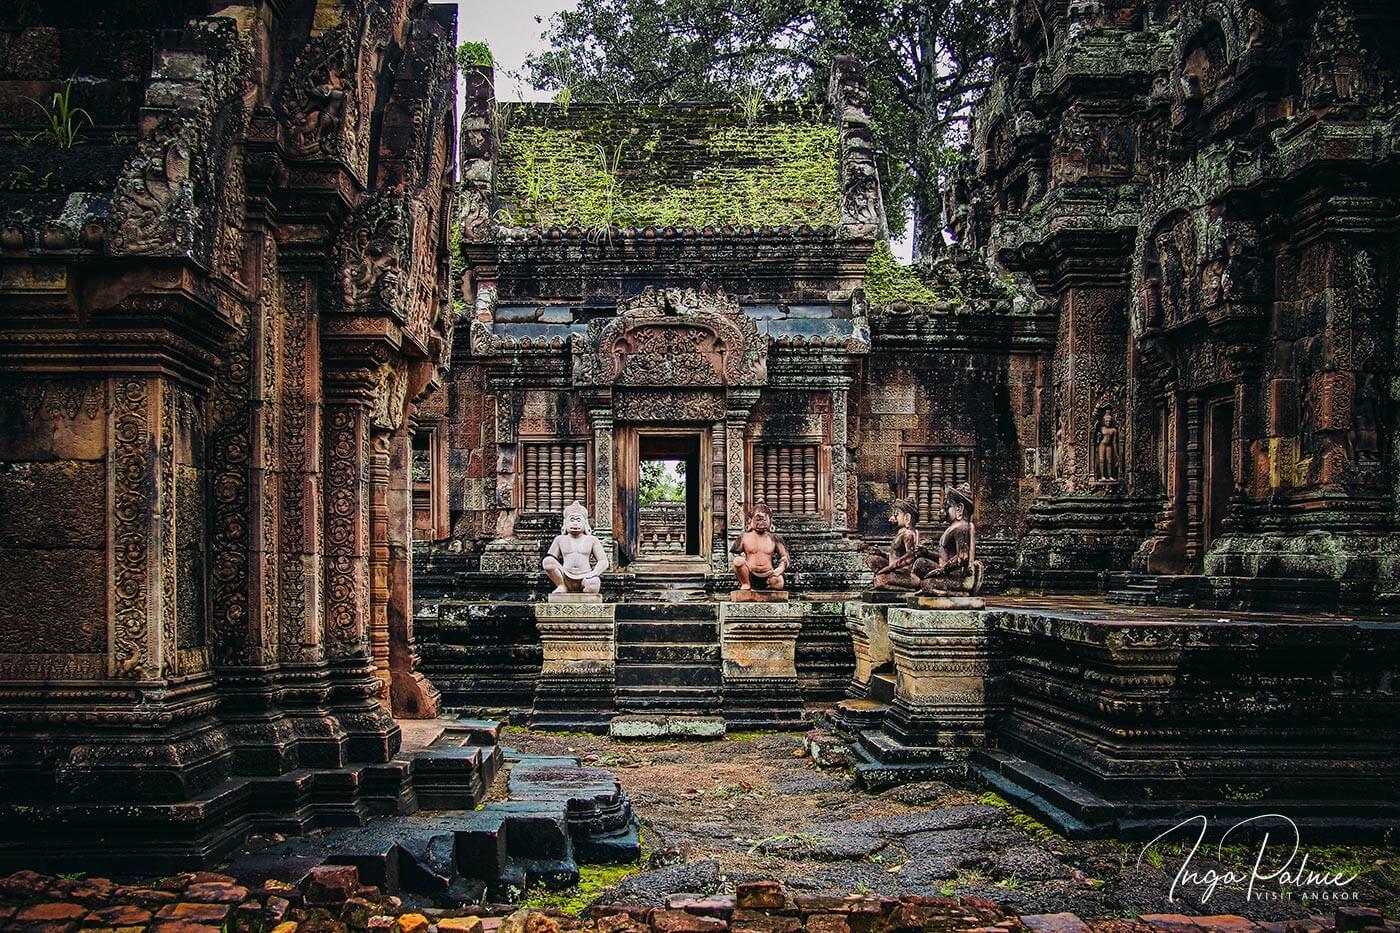 Markante Figuren zieren den Banteay Srei Tempel